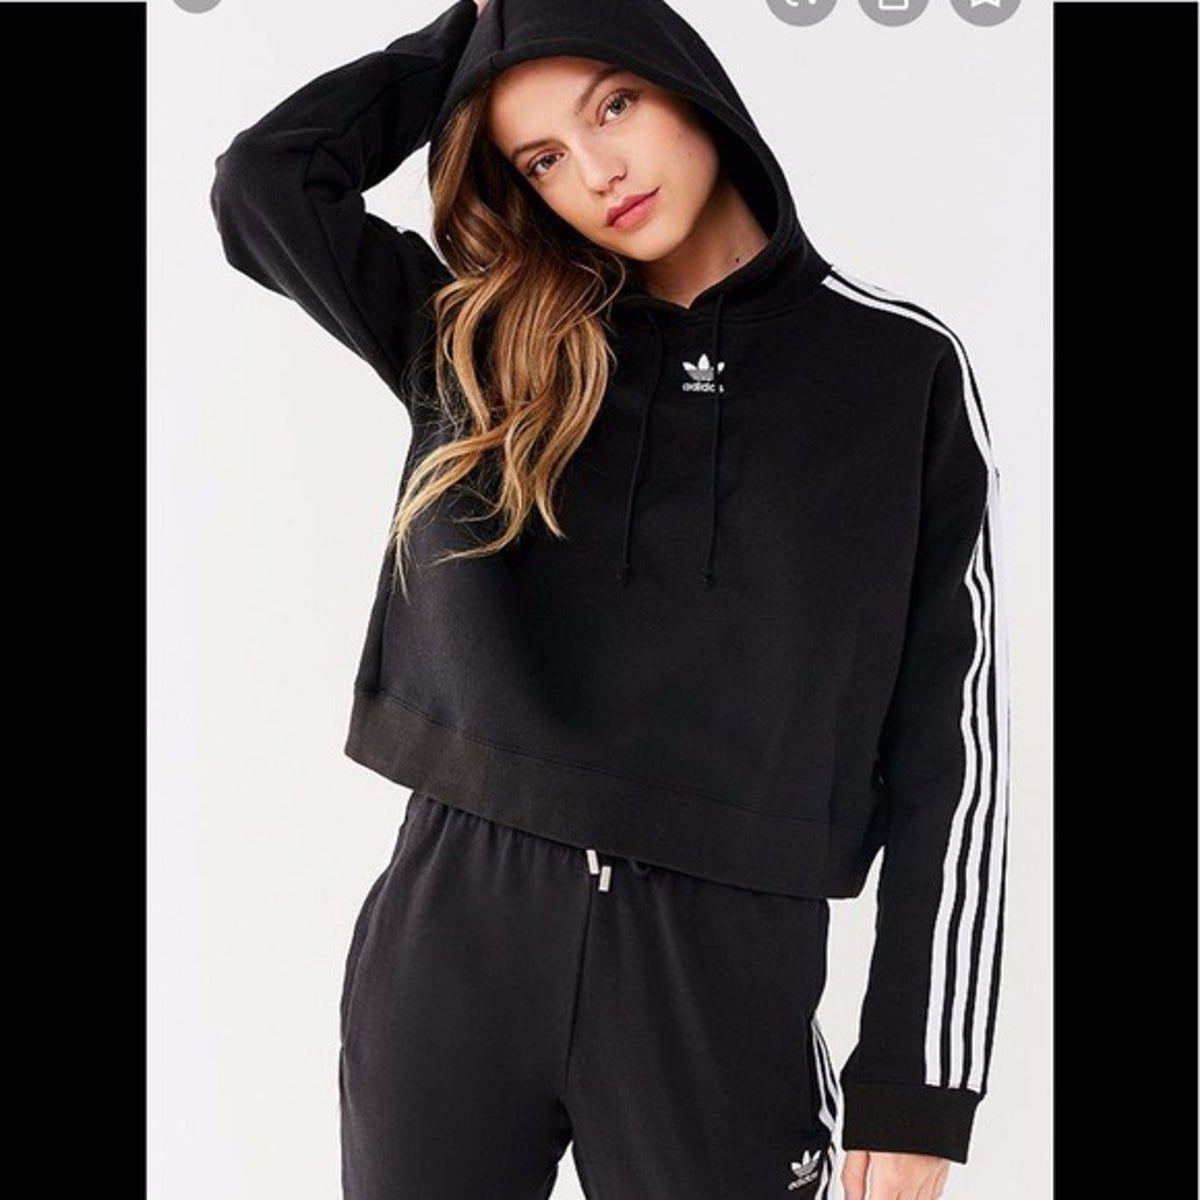 Nwt Uo Adidas Cropped Sweatshirt In 2020 Crop Sweatshirt Hoodie Adidas Cropped Hoodie Cropped Hoodie [ 1200 x 1200 Pixel ]